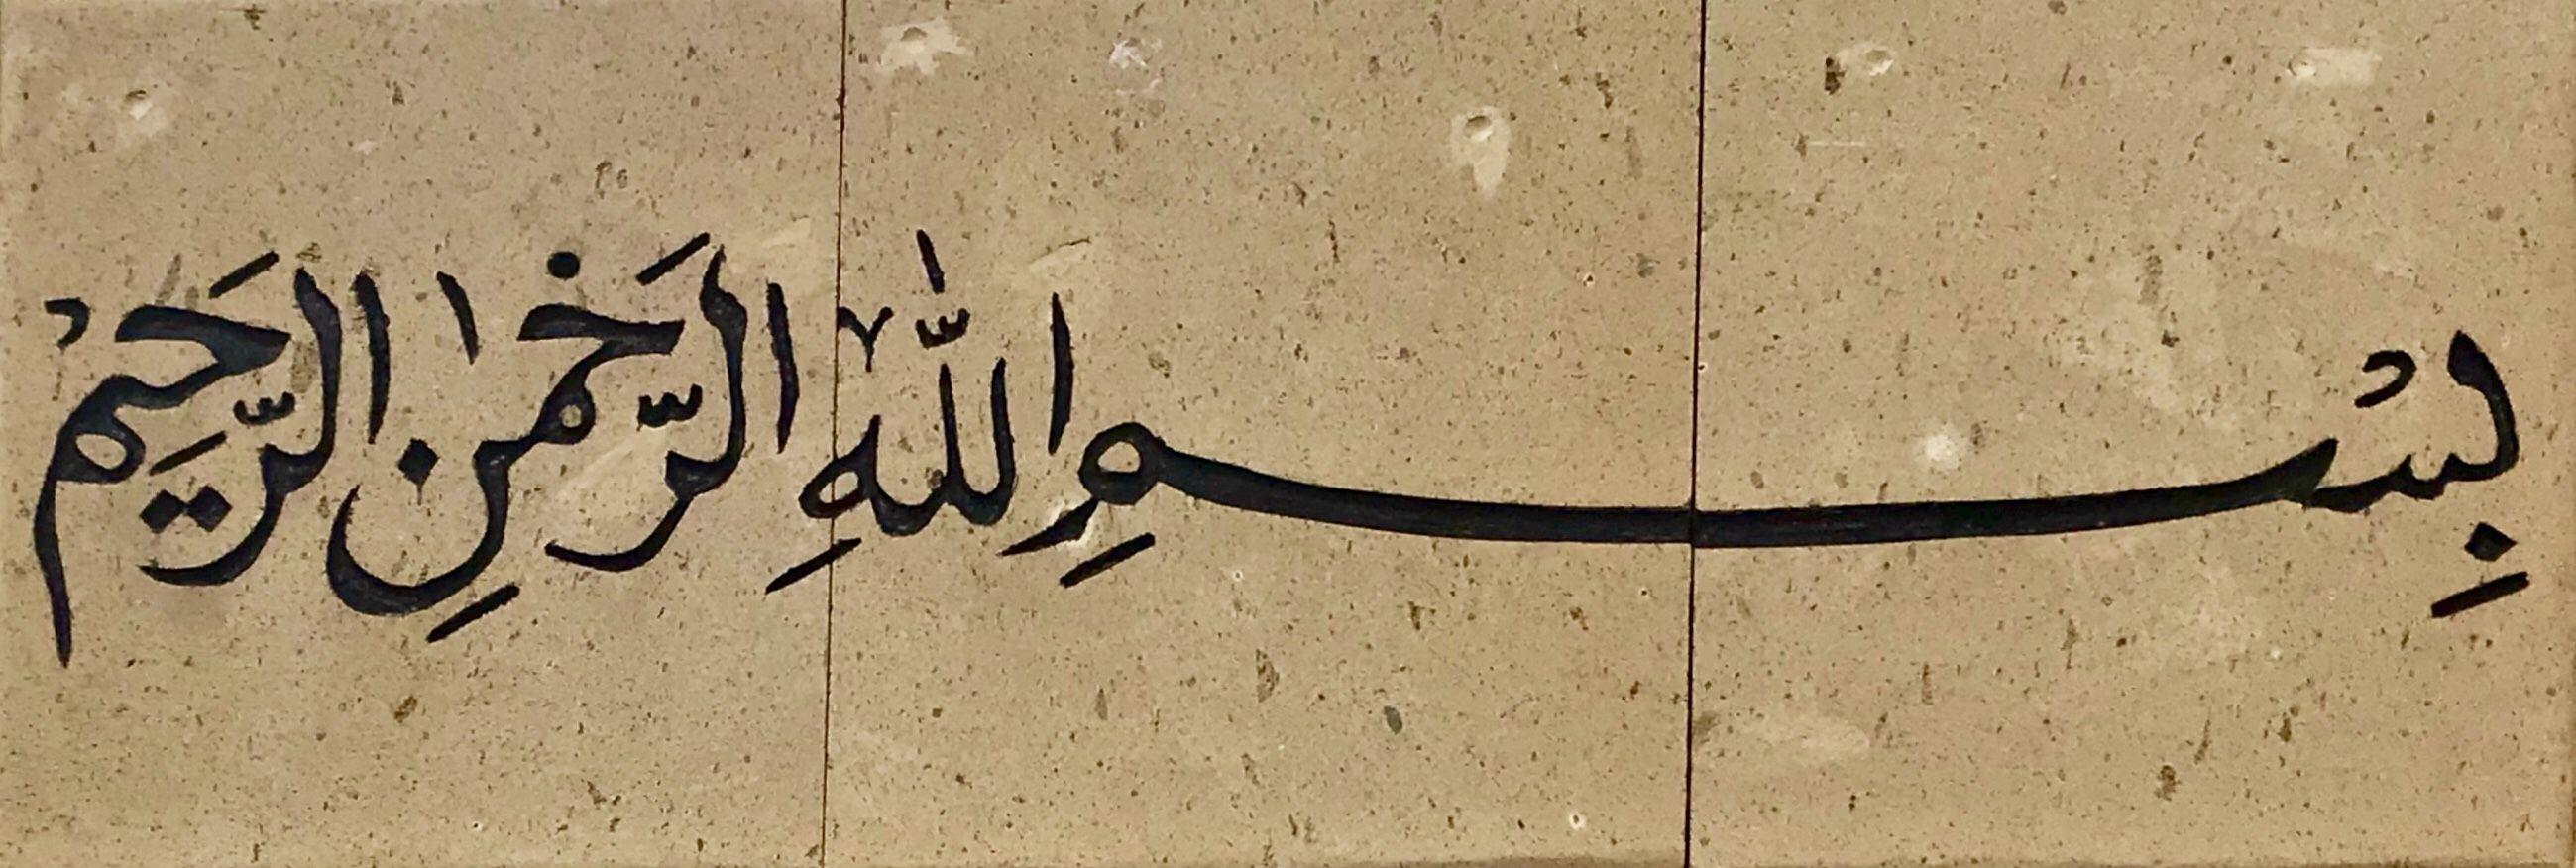 Bismillahirrahmanirrahim. Arabic calligraphy, Calligraphy